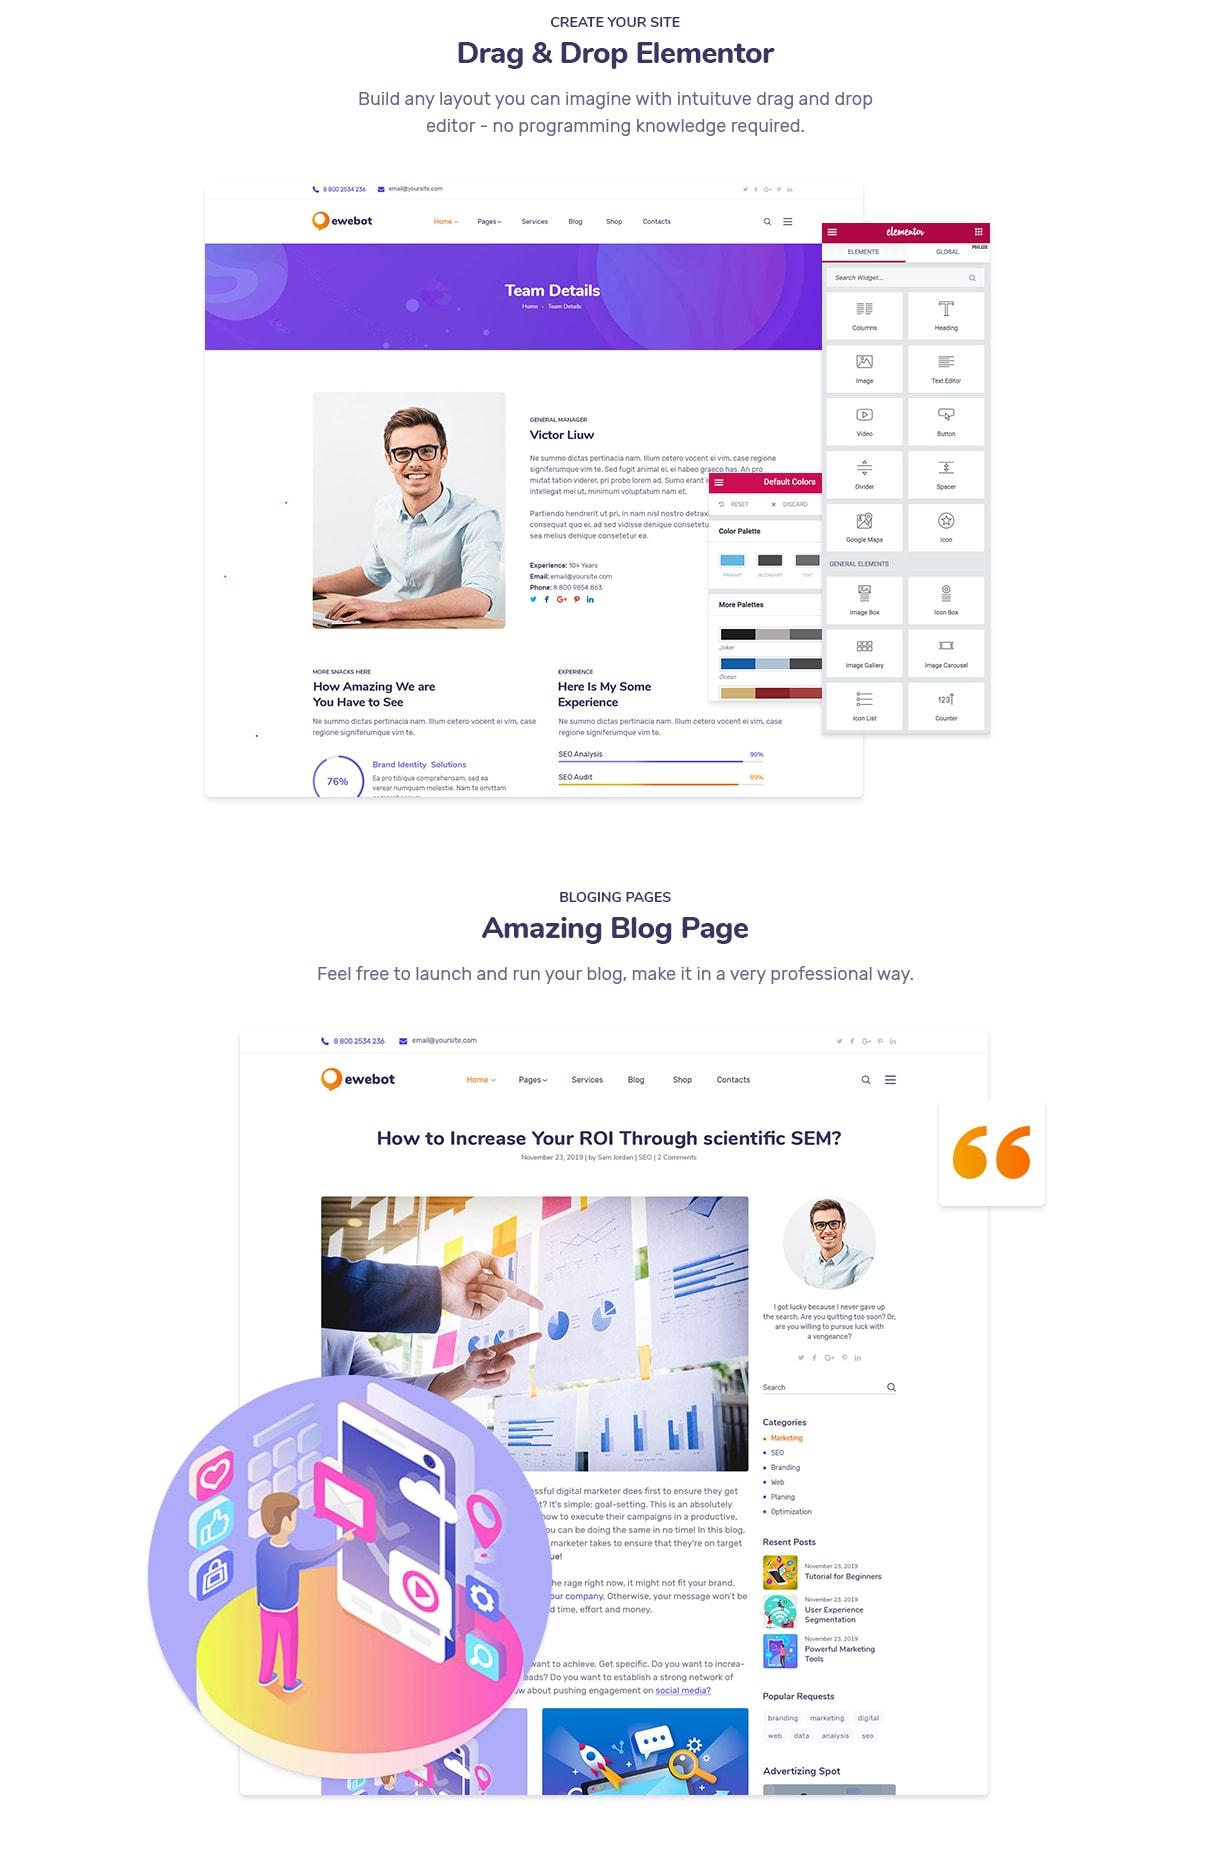 ewebot wp3 - Ewebot - SEO Marketing & Digital Agency